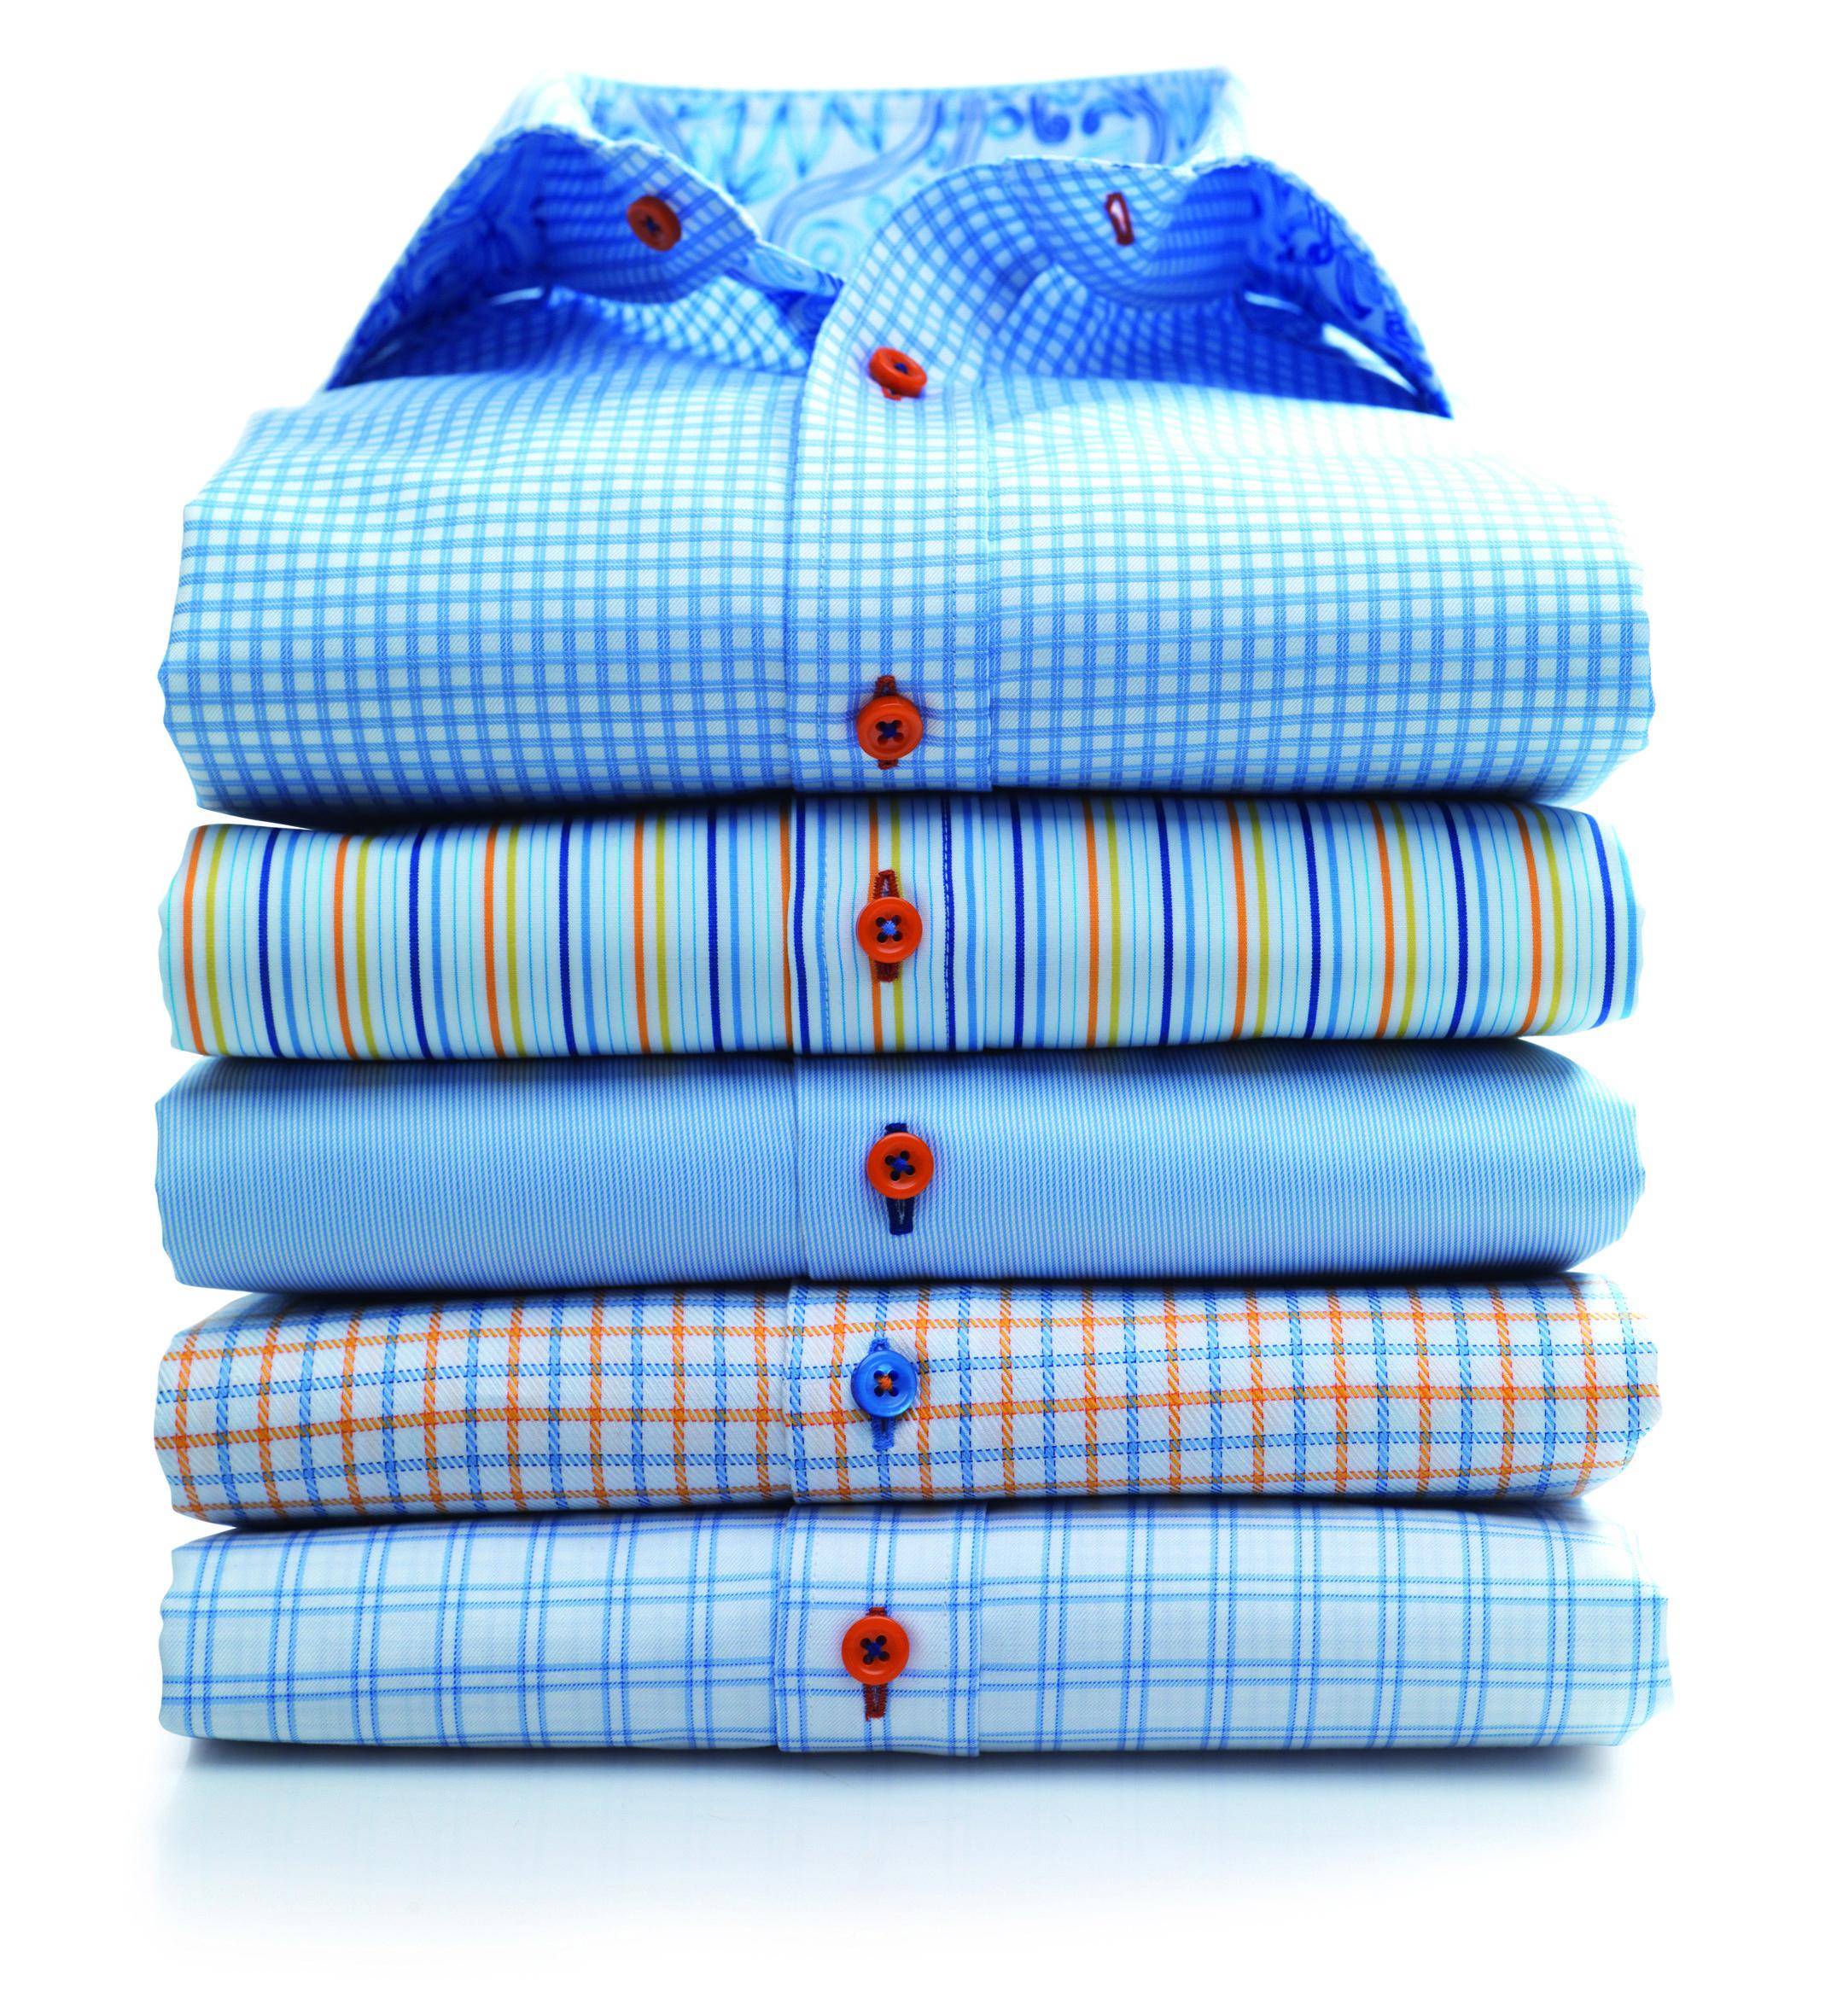 Ralph Lauren Shop Men's & Women's Clothing, Shirts